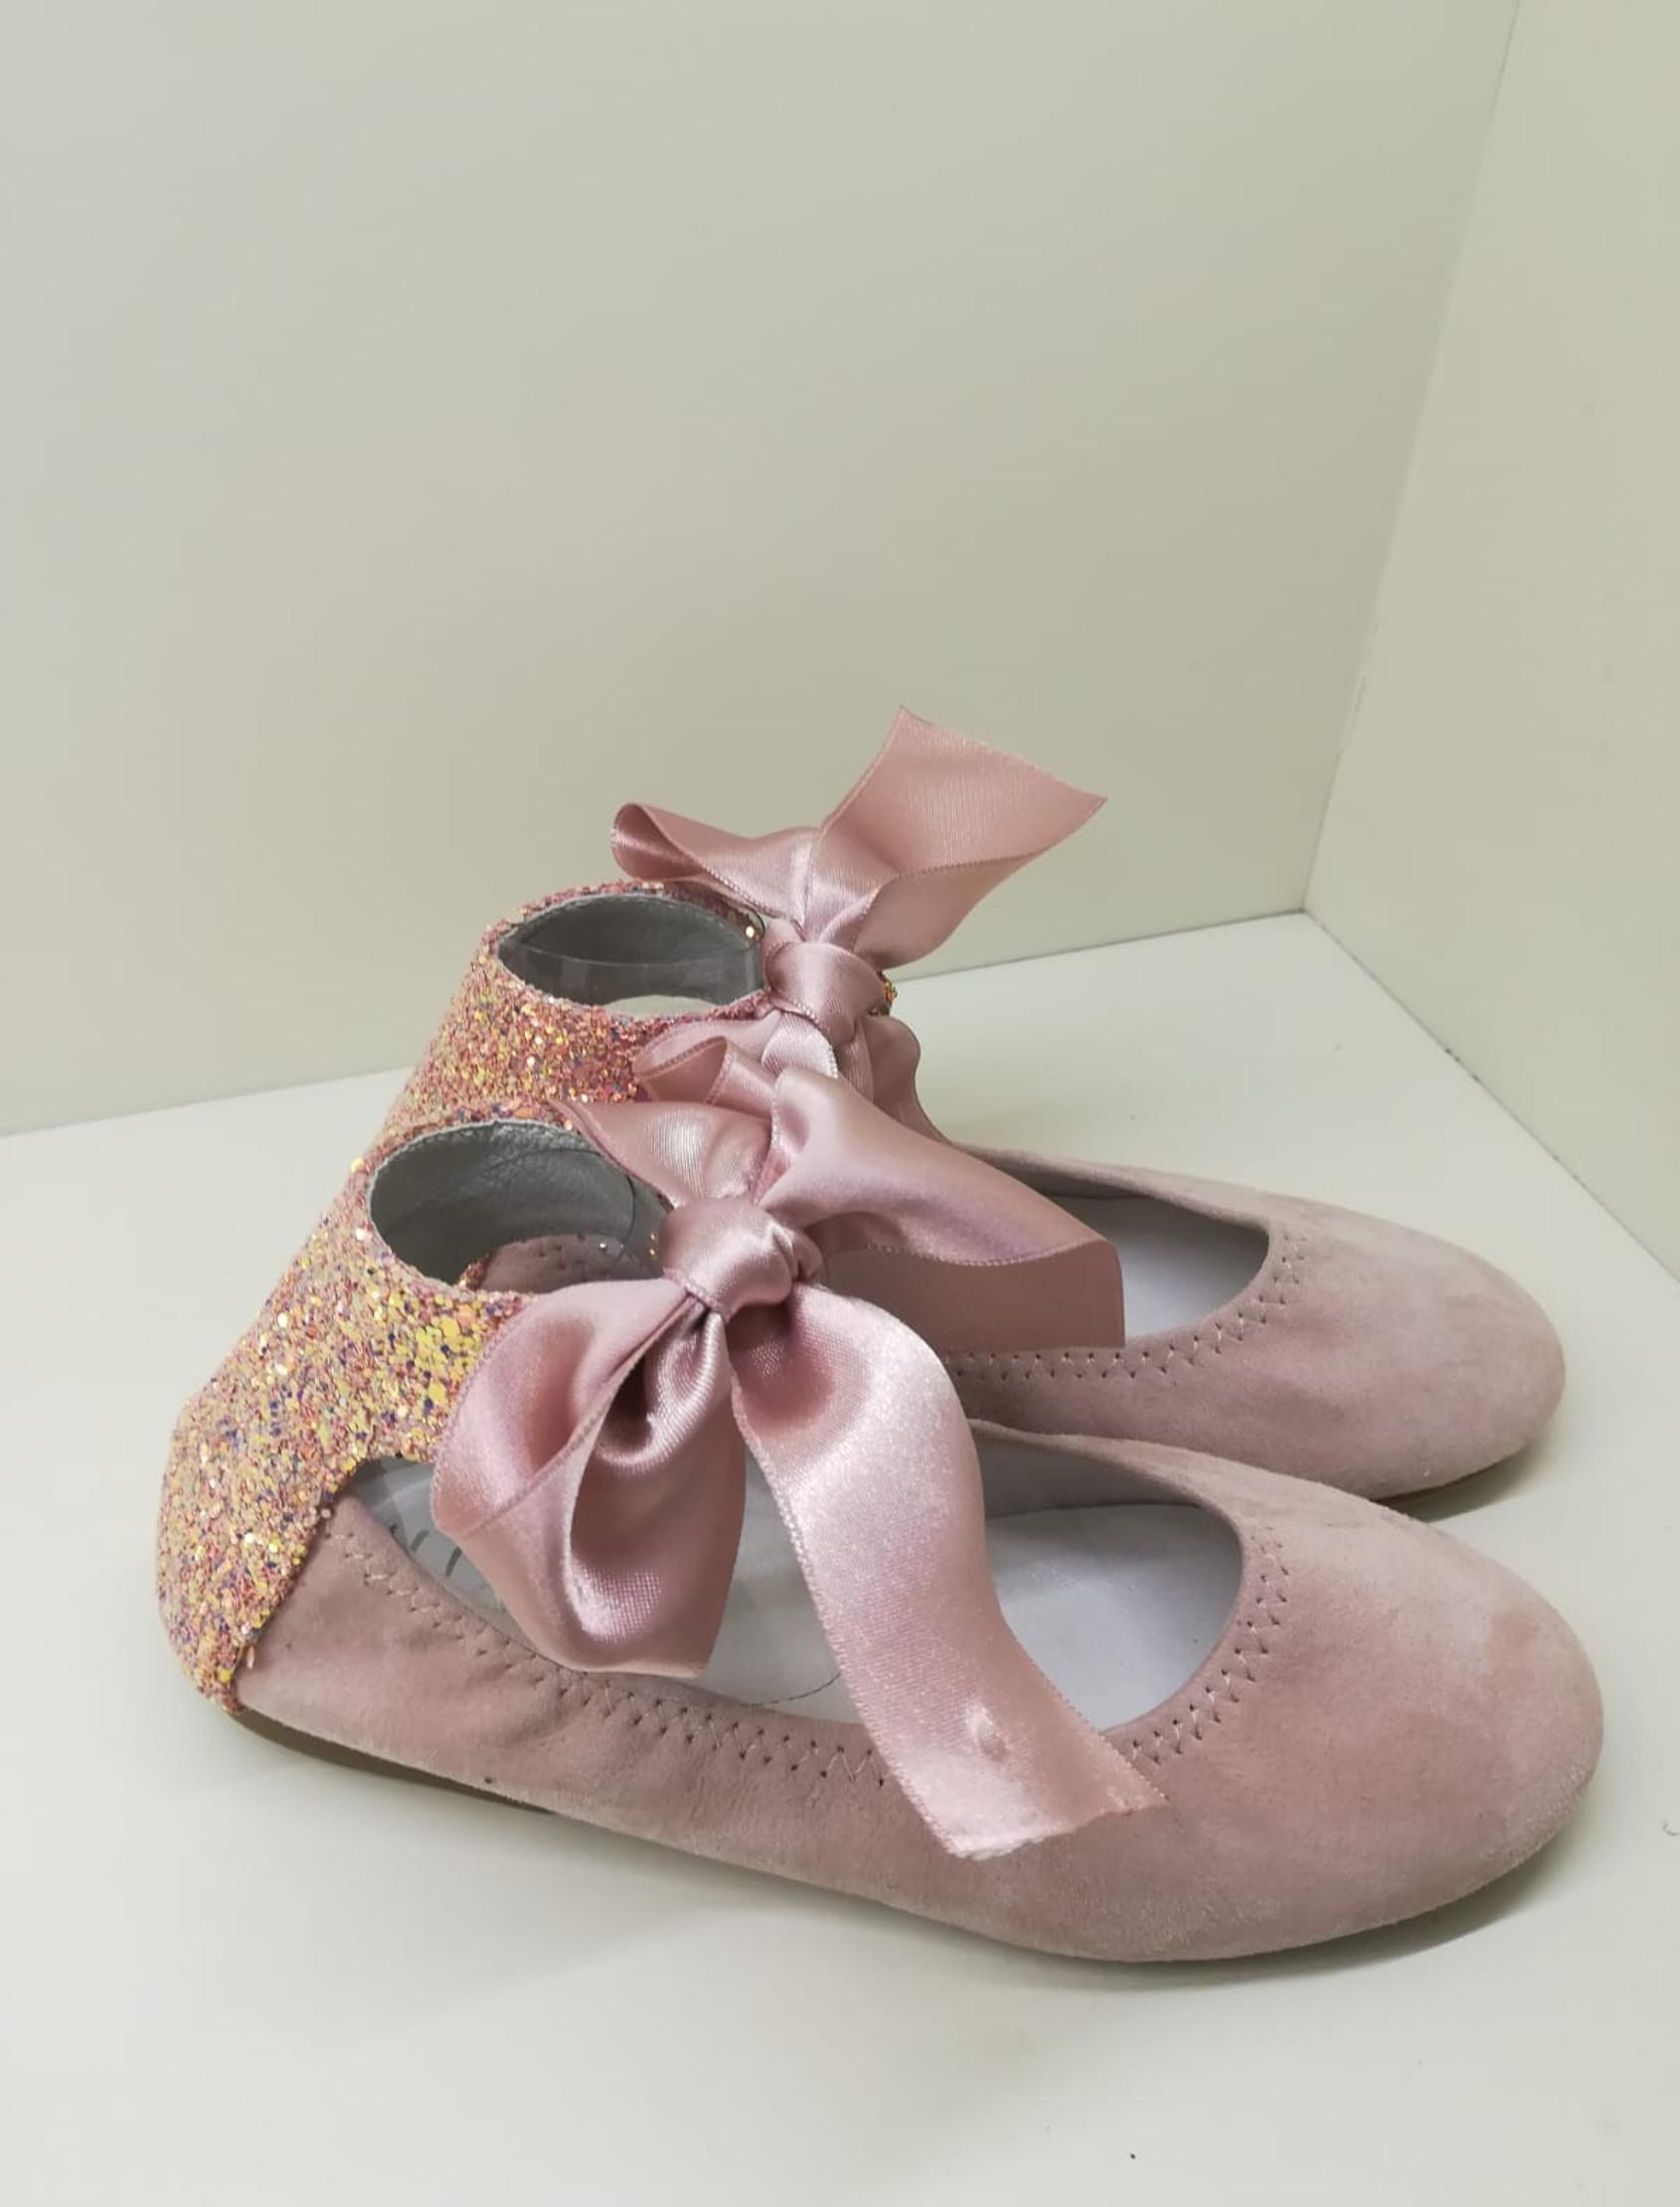 Bailarina en ante rosa con trasera en glitter rosa. Ata al tobillo con lazo ancho de raso.